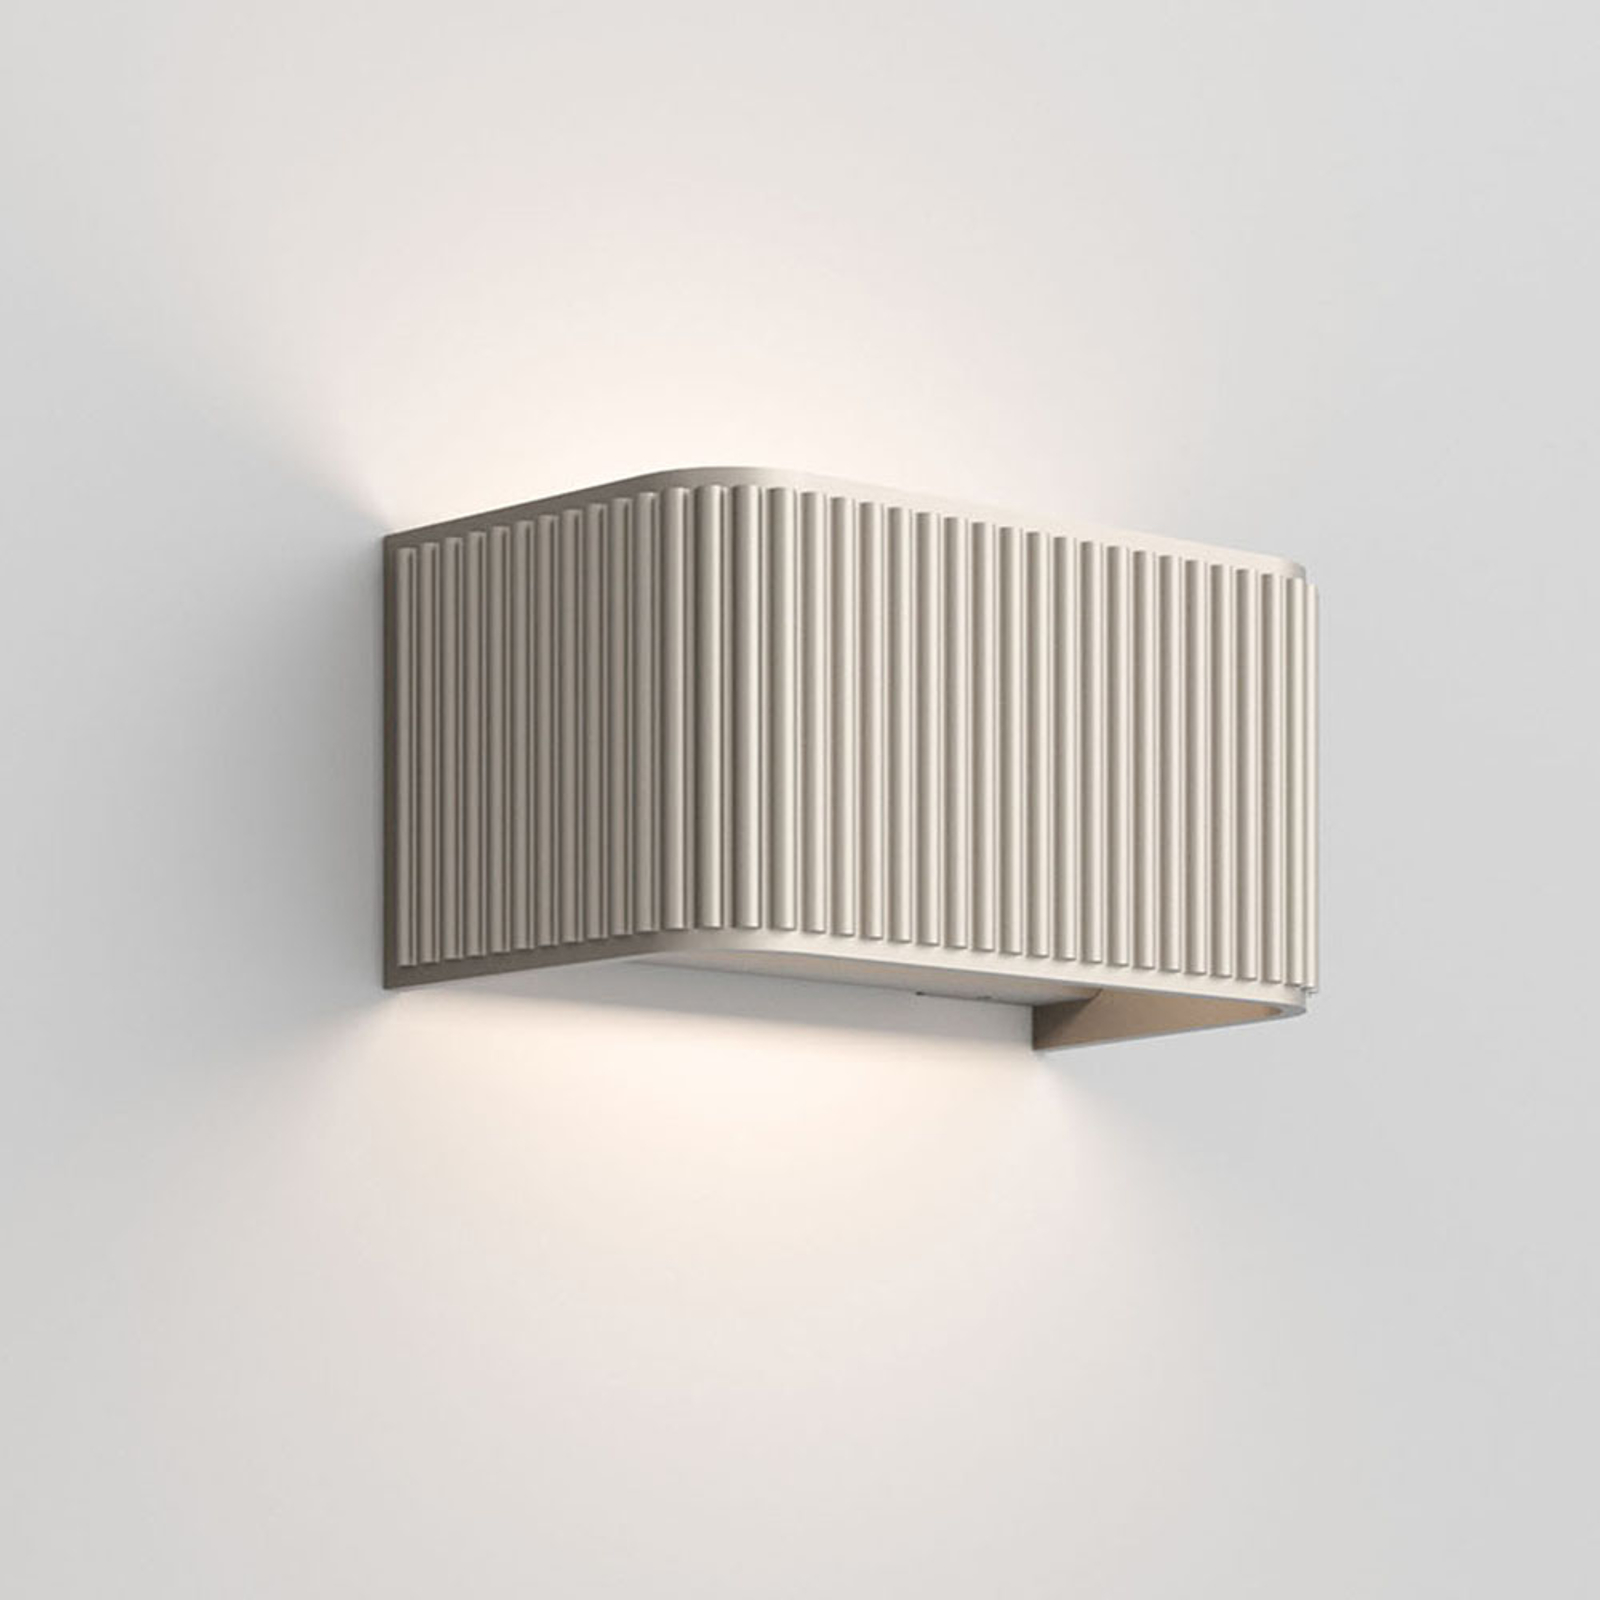 Rotaliana Dresscode W1 LED-seinävalo pronssi 2700K